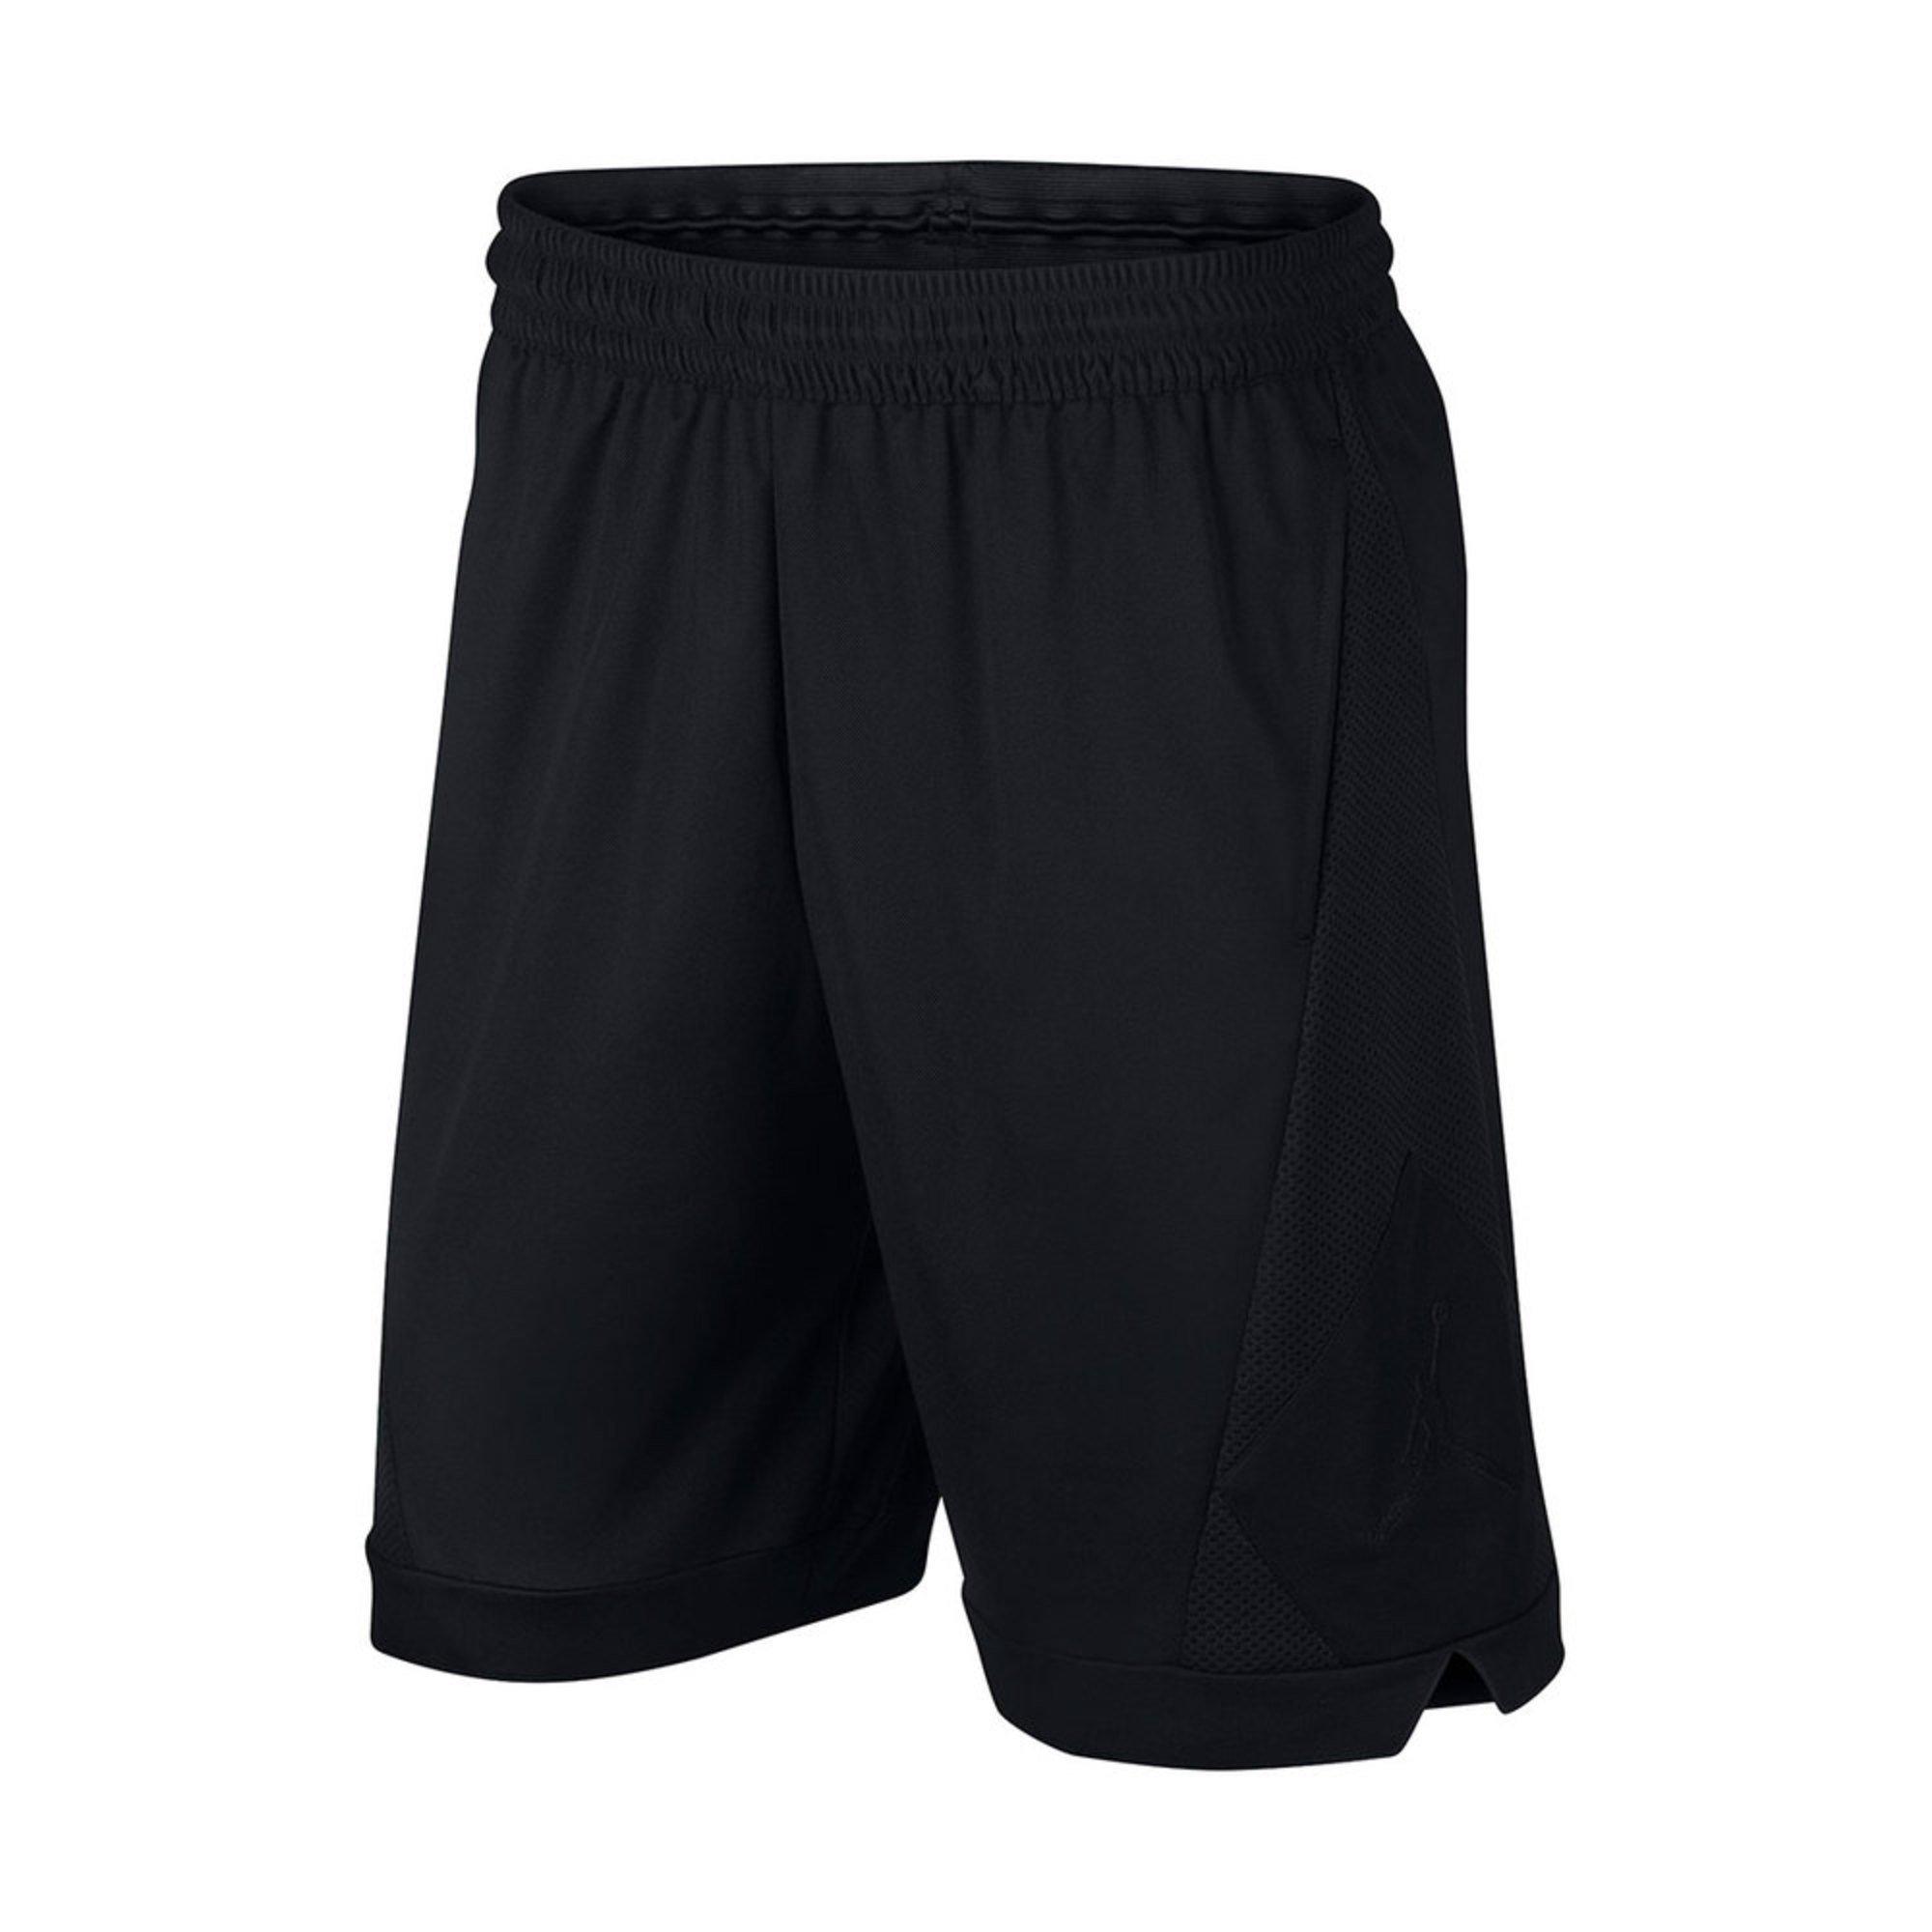 e44989440cd Jordan Men's Triangle Shorts | Active Shorts | Apparel - Shop Your ...